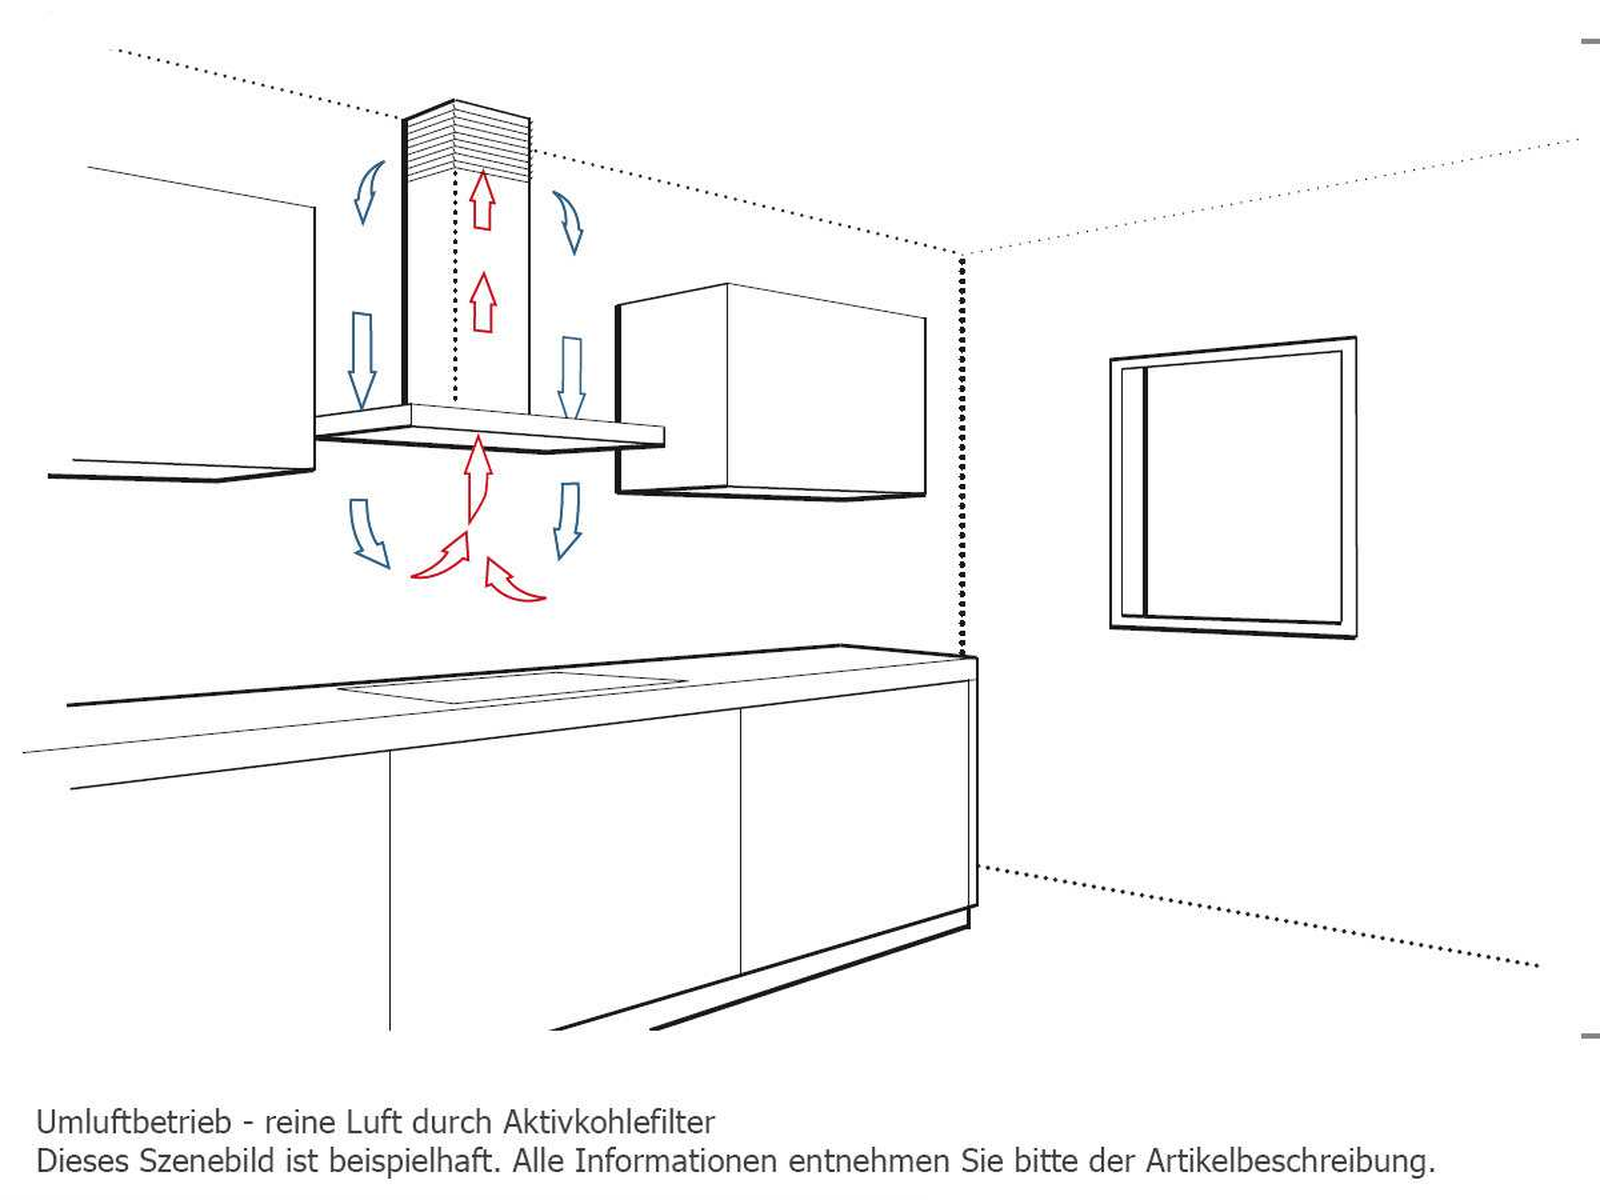 Bosch DRR16AQ20 Deckenhaube 105 cm Weiß